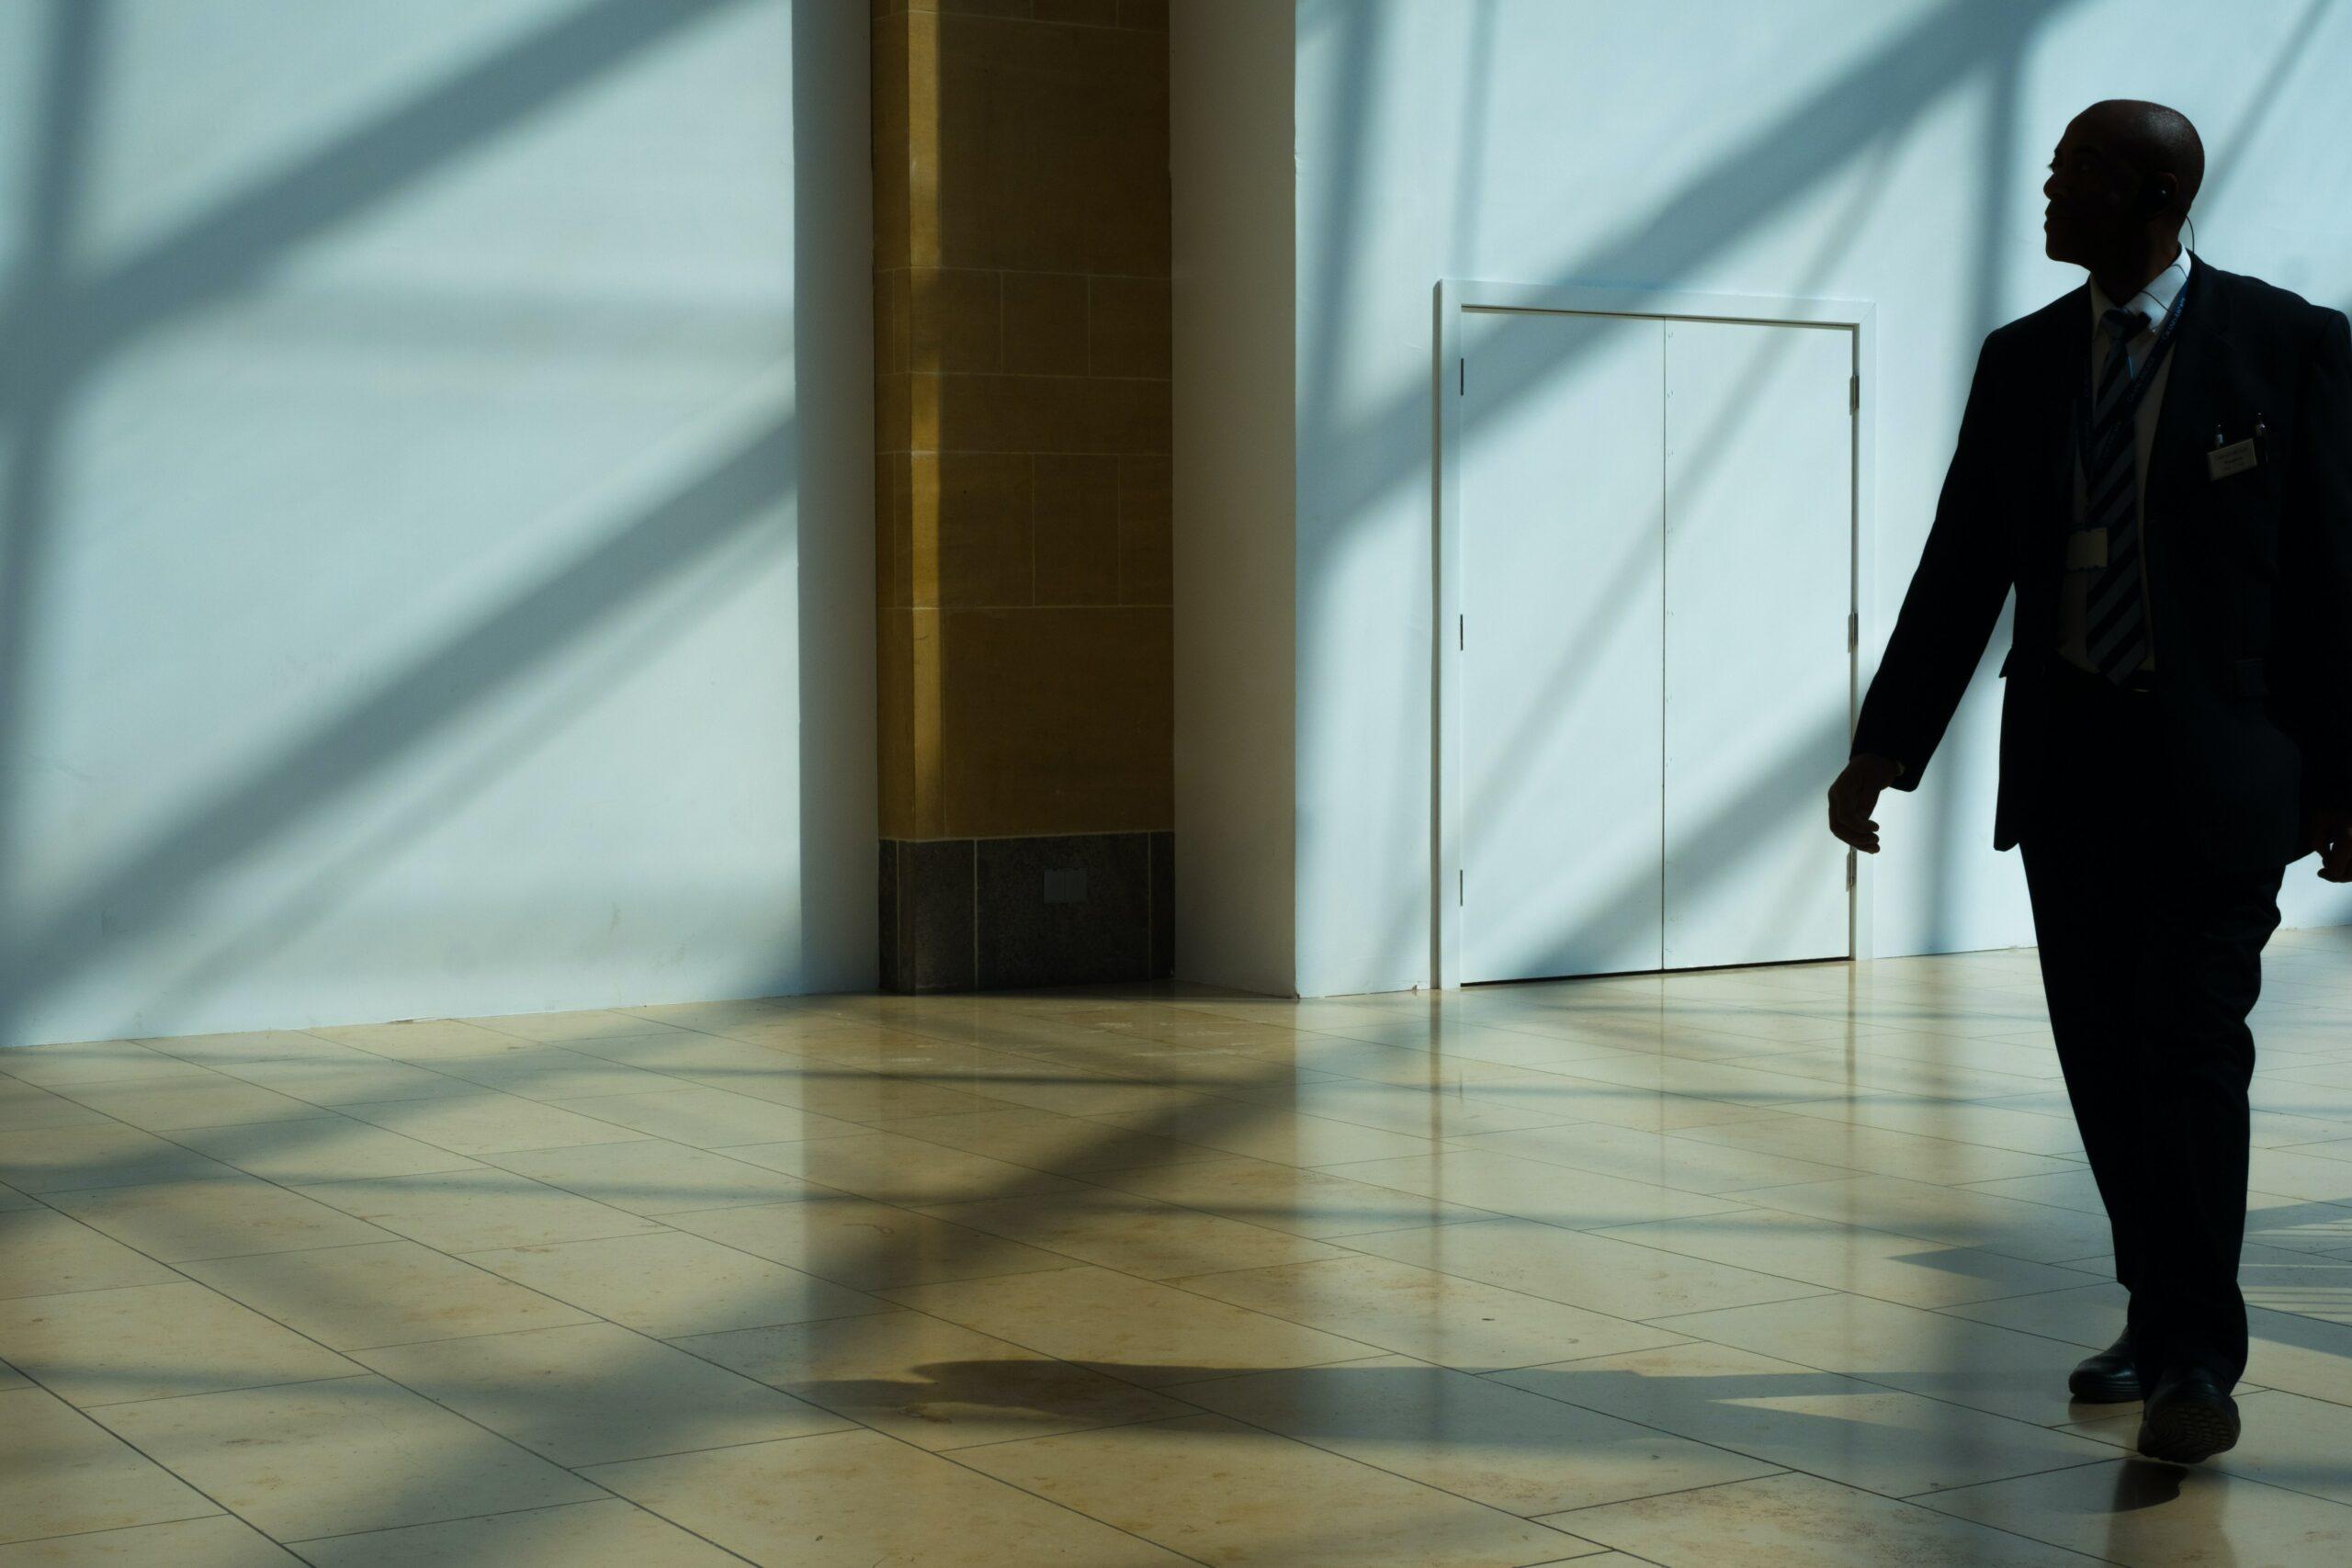 man walking on hallway